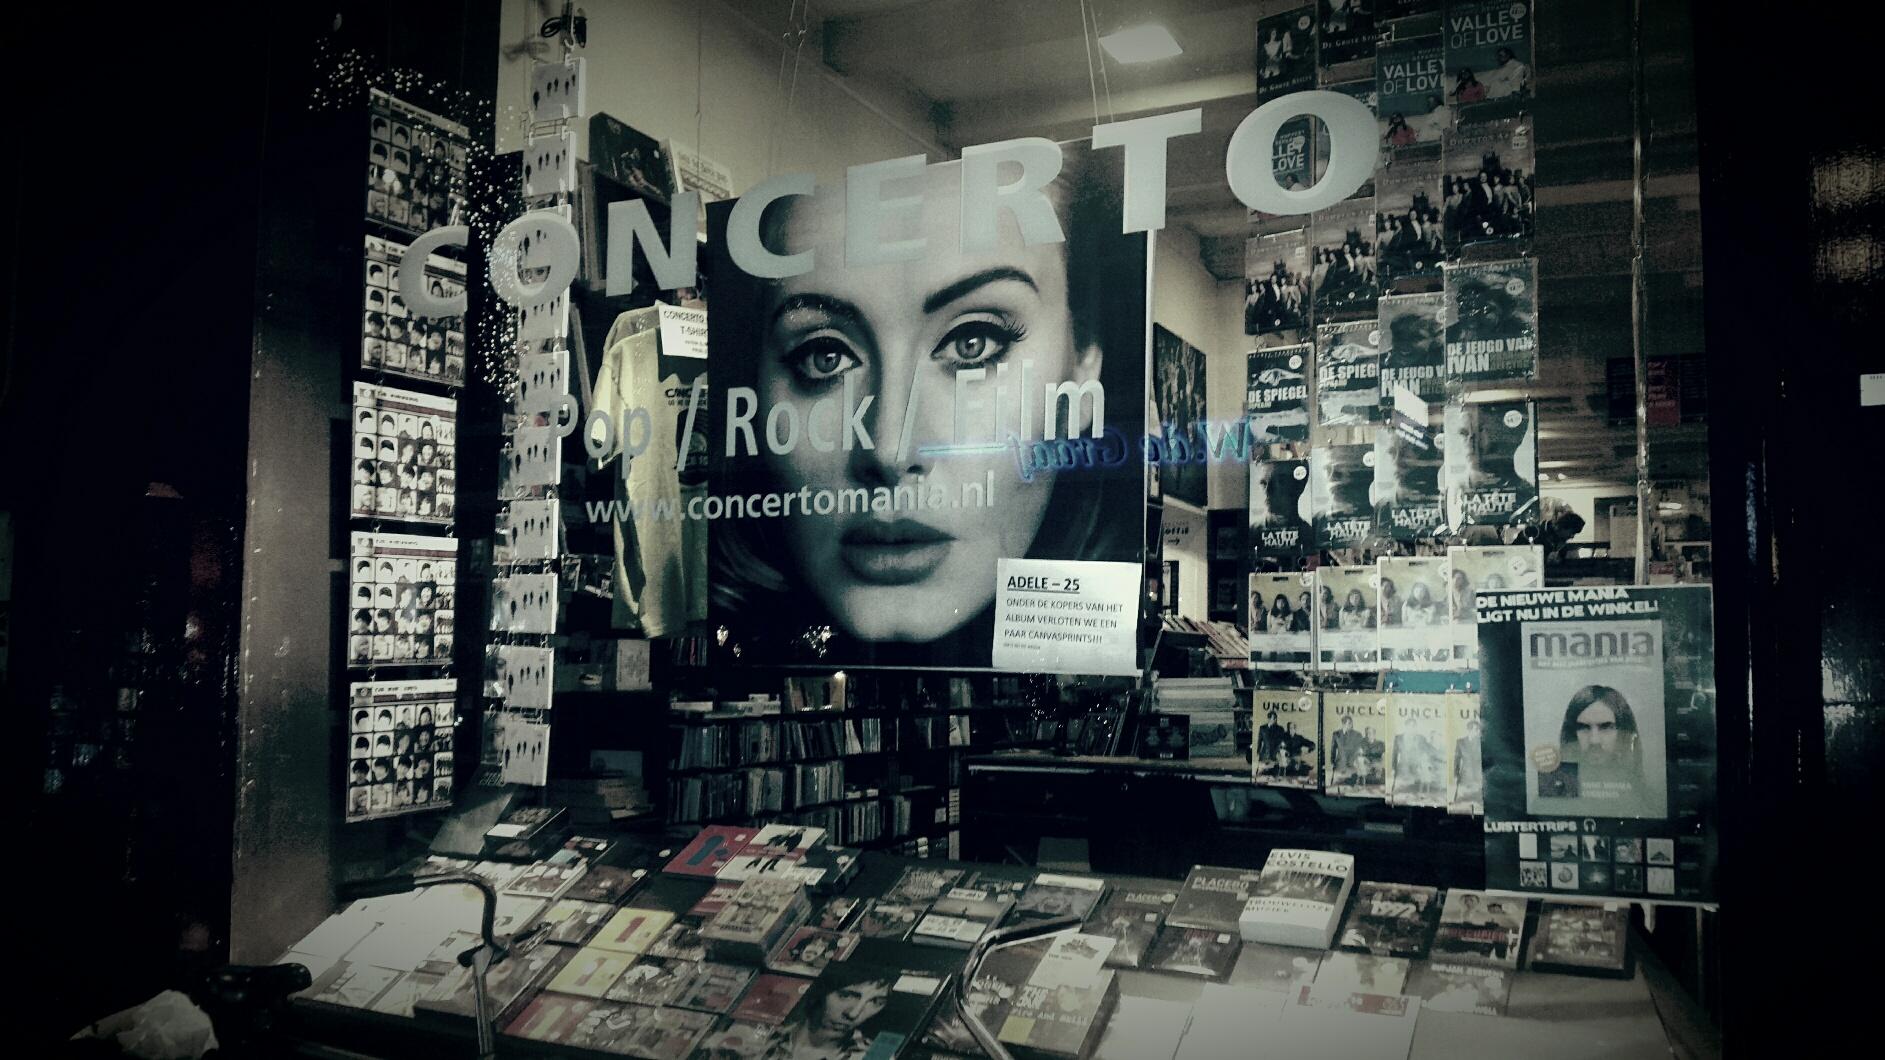 Adele, V&D, retail, concerto, marketing, doelgroep, platenzaak